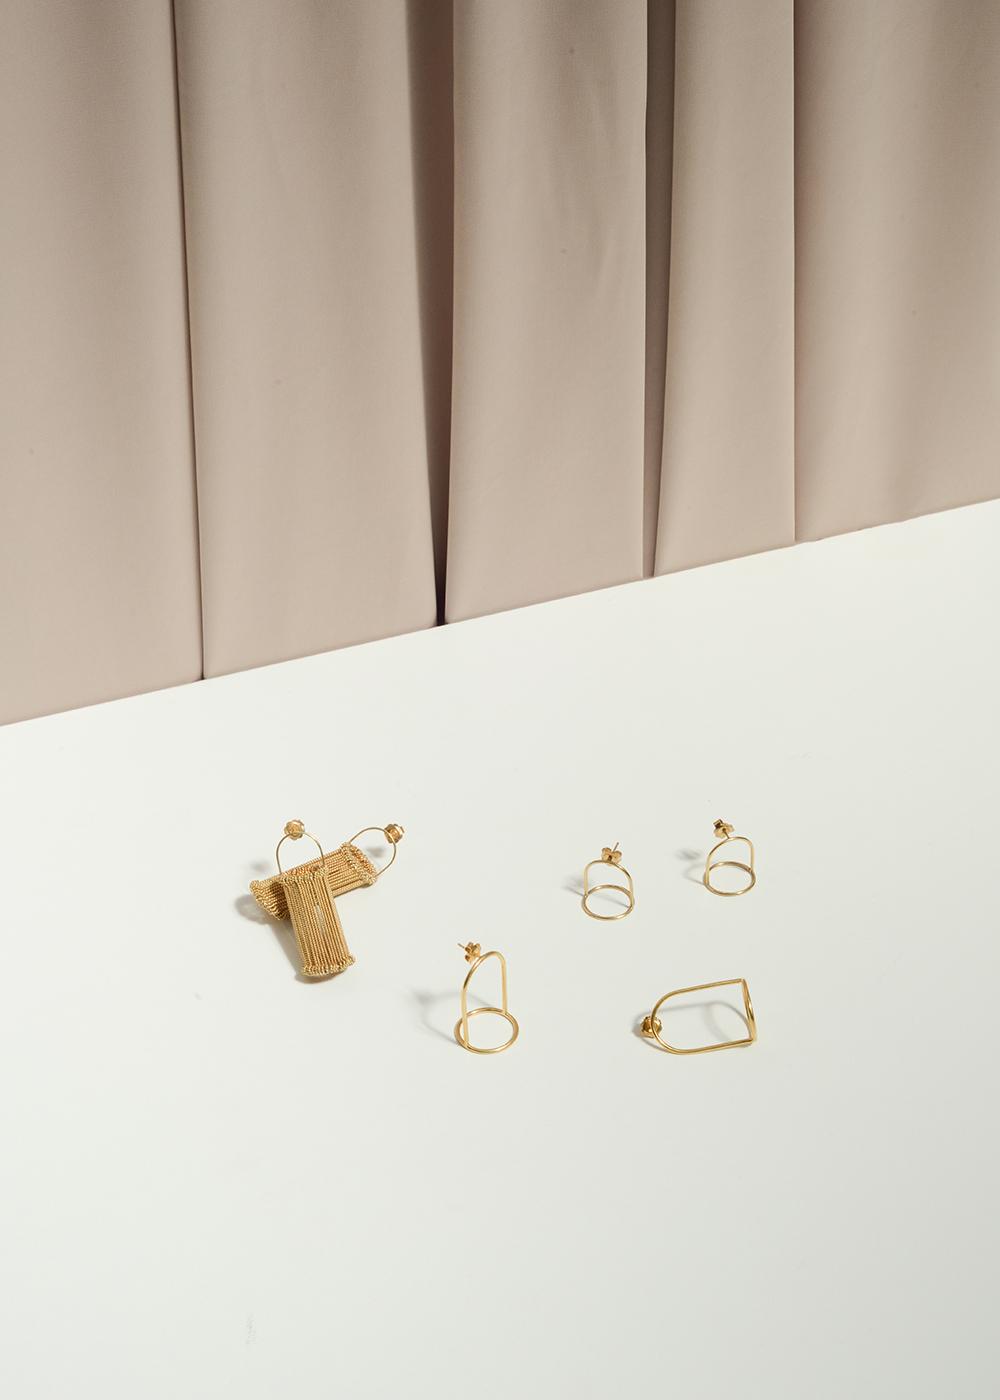 Heddle, Mini Bell Jar and Bell Jar earrings